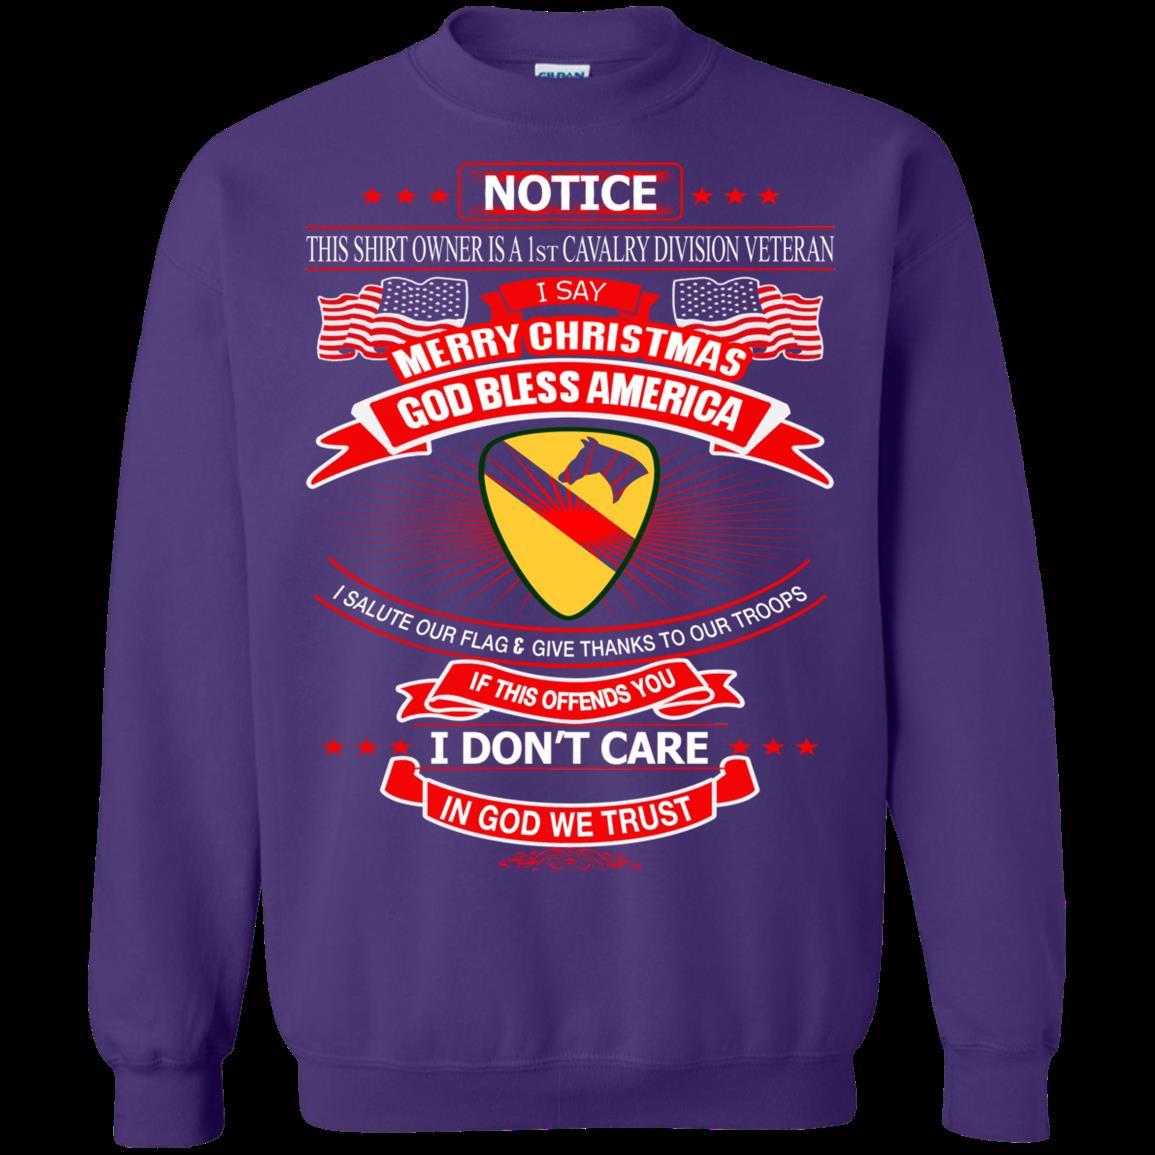 1st Cavalry Divison Veteran Christmas Shirts In God We Trust 1